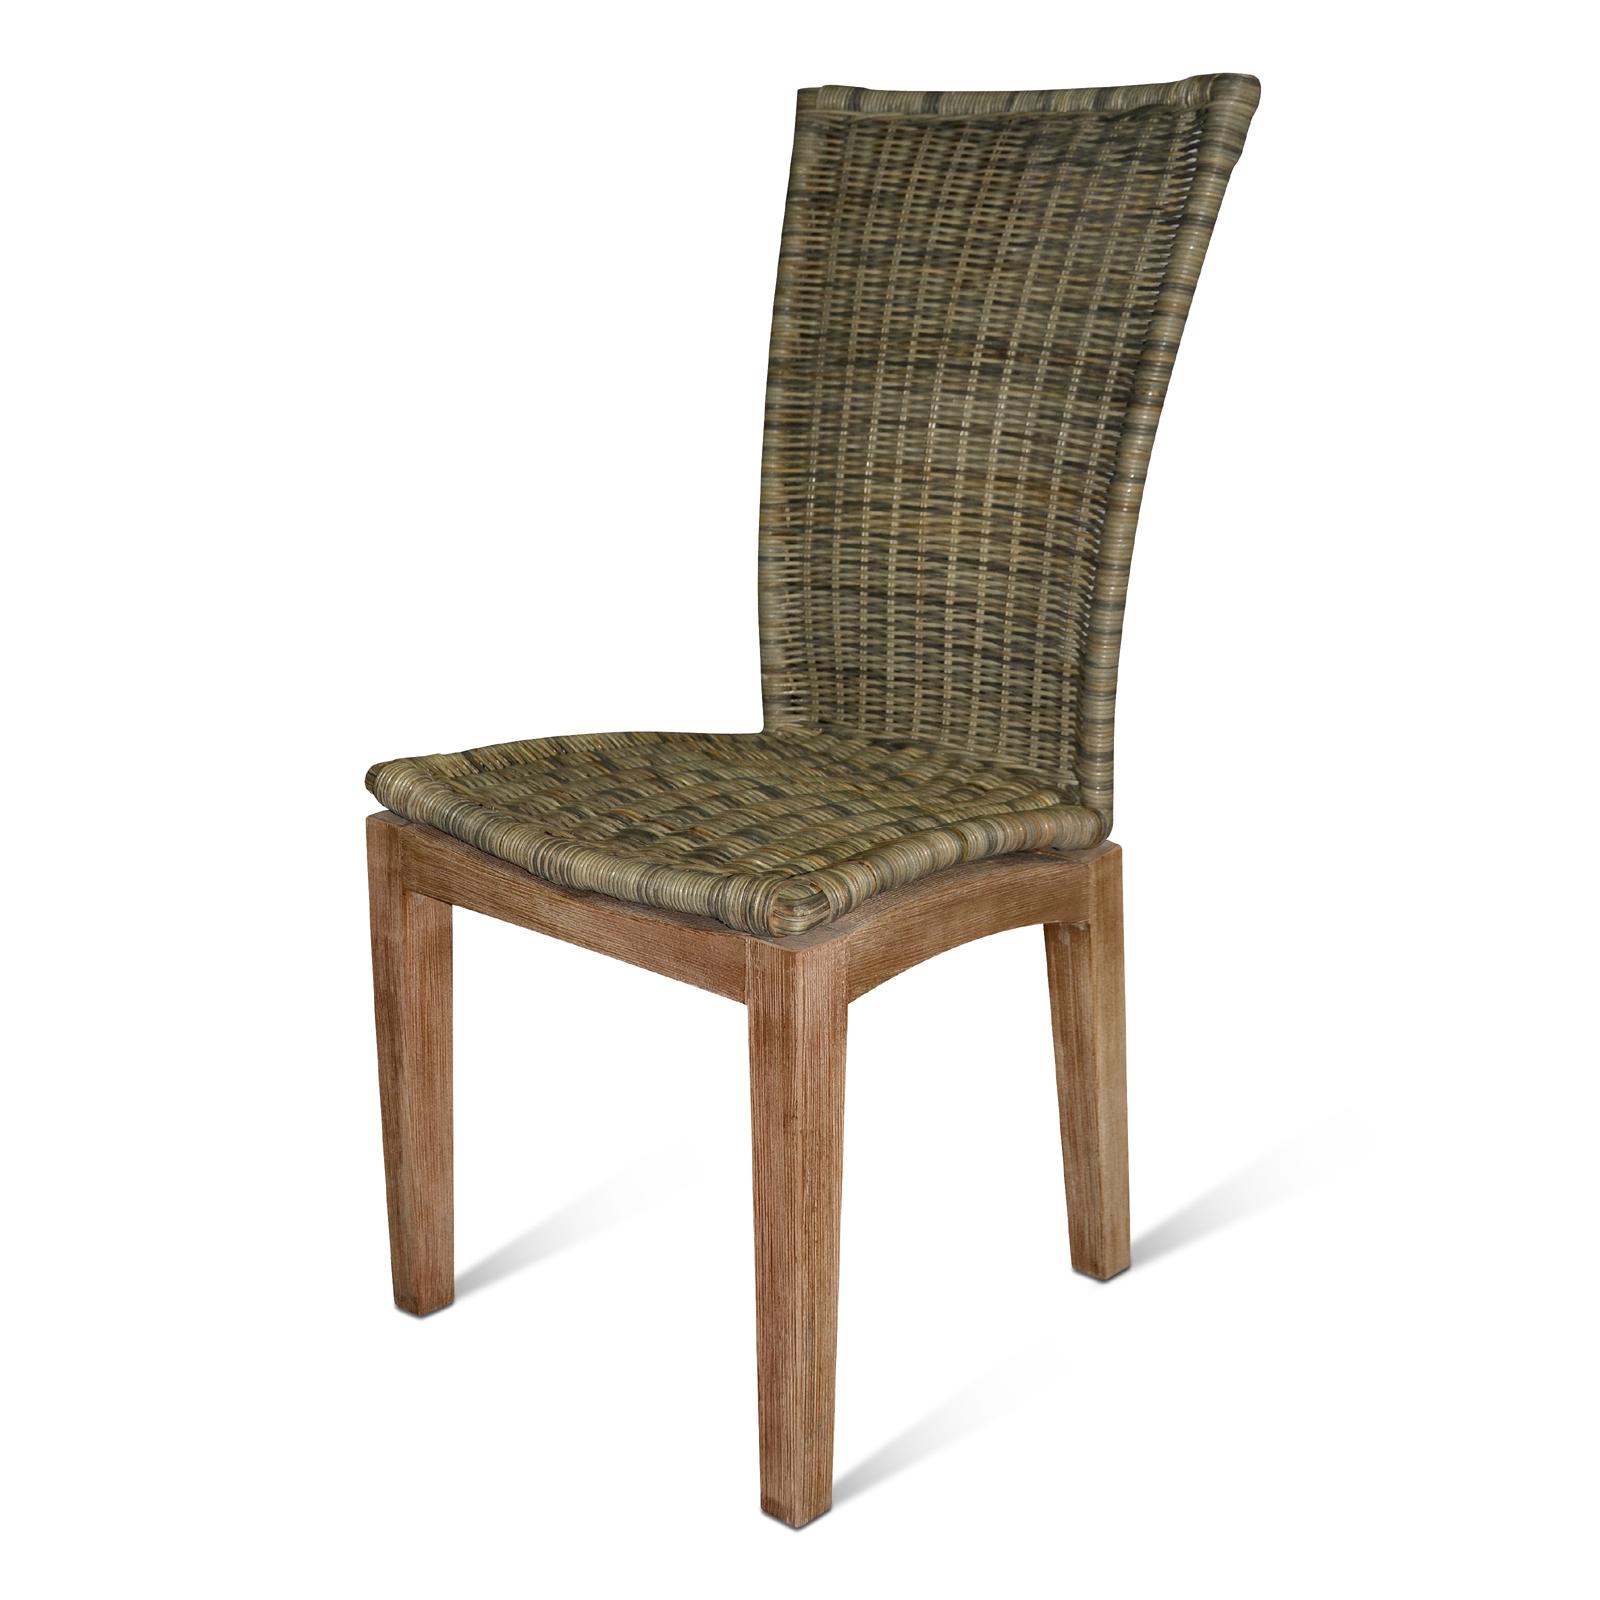 sam esszimmer stuhl rattan casablanca auf lager. Black Bedroom Furniture Sets. Home Design Ideas